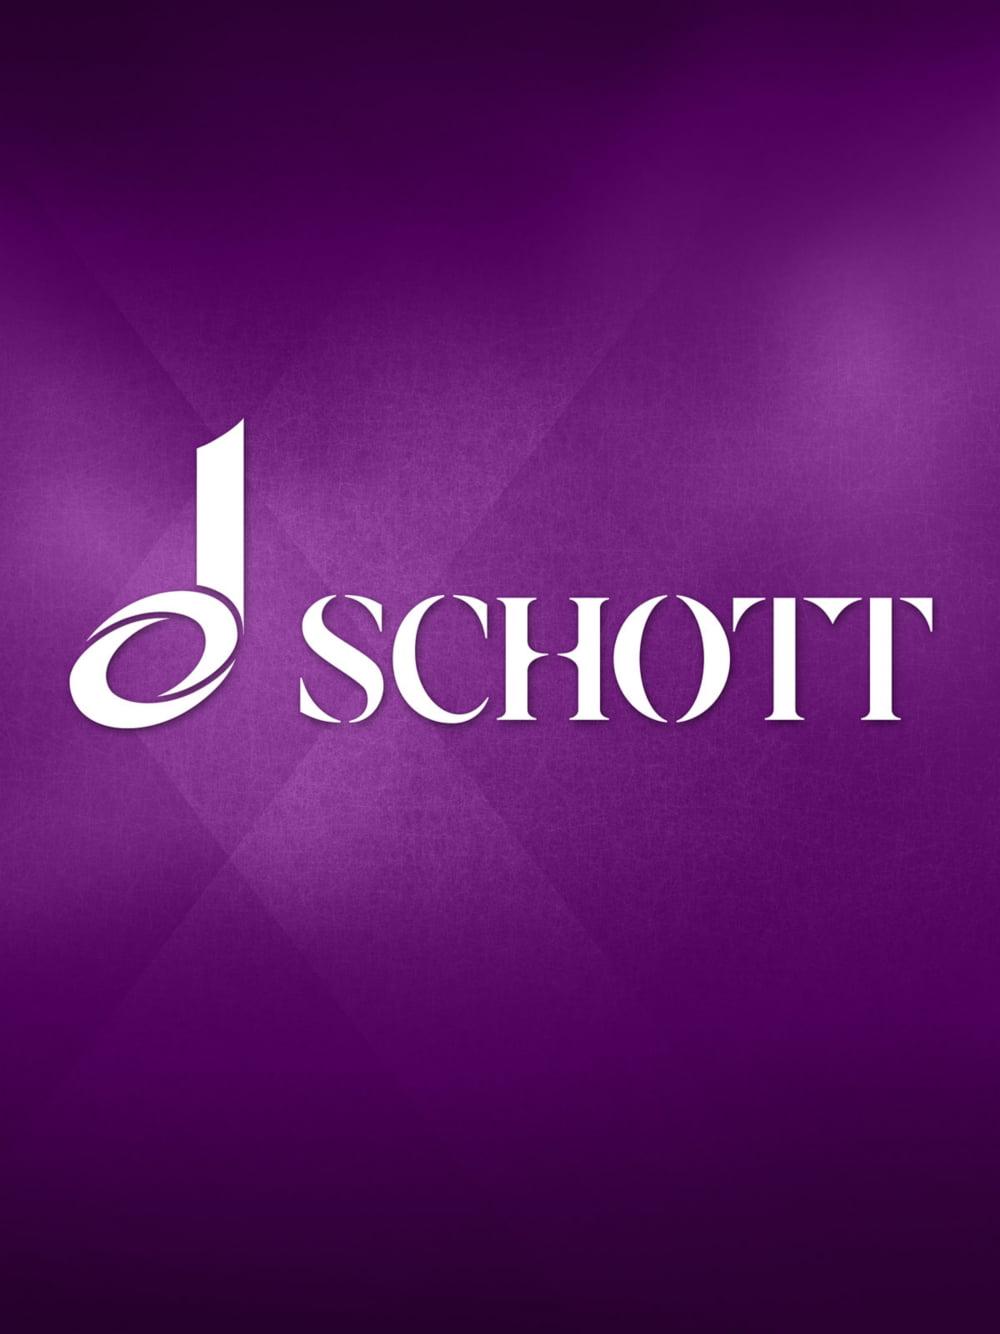 Eulenburg Concerto for Bassoon in B Major Op. 45, No. 8 La notte (Cembalo Part) Schott... by Eulenburg